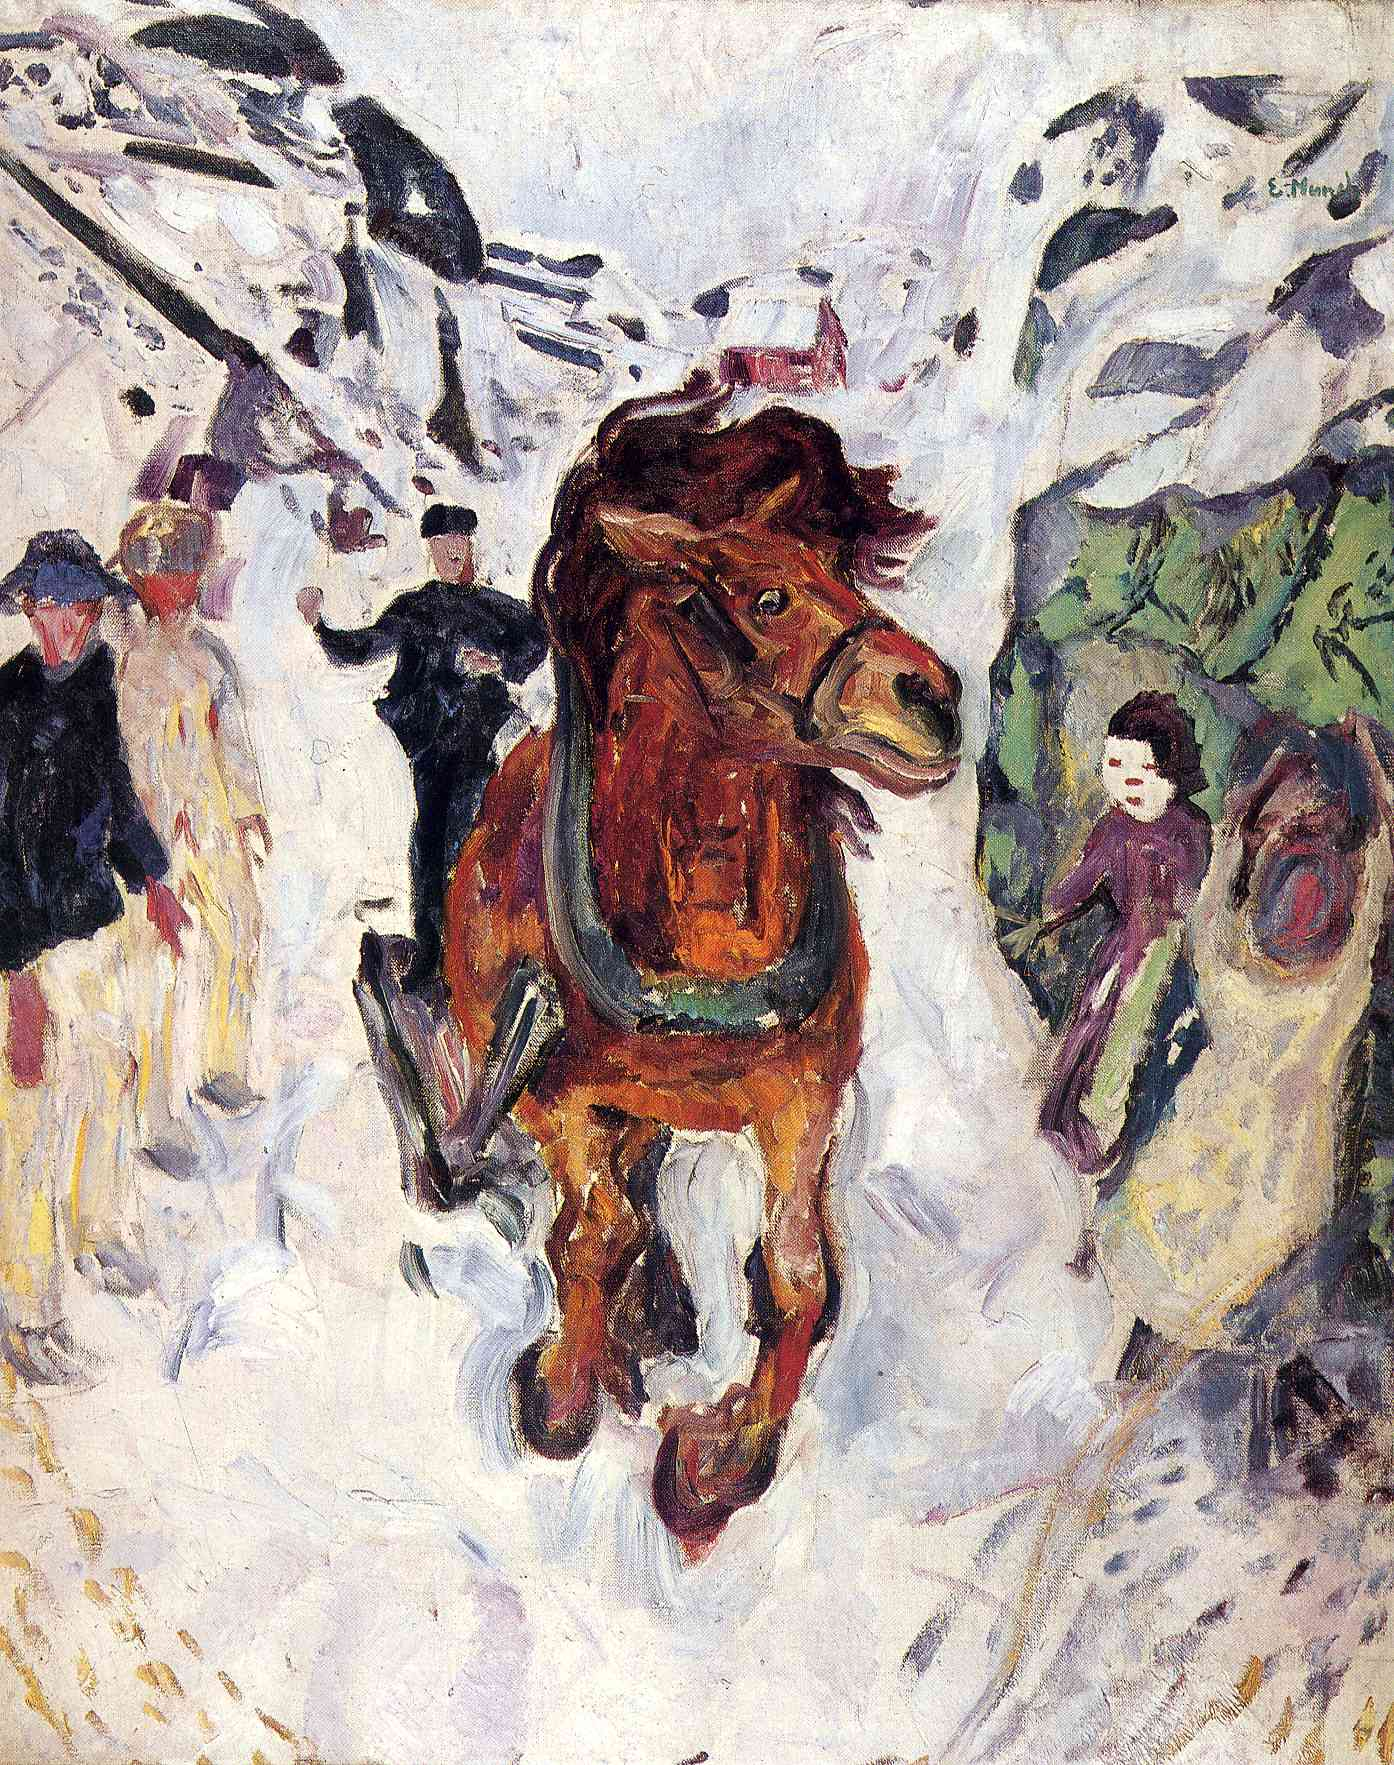 Galloping horse, 1912 #munch #norwegianart https://t.co/meVBNJfGl4